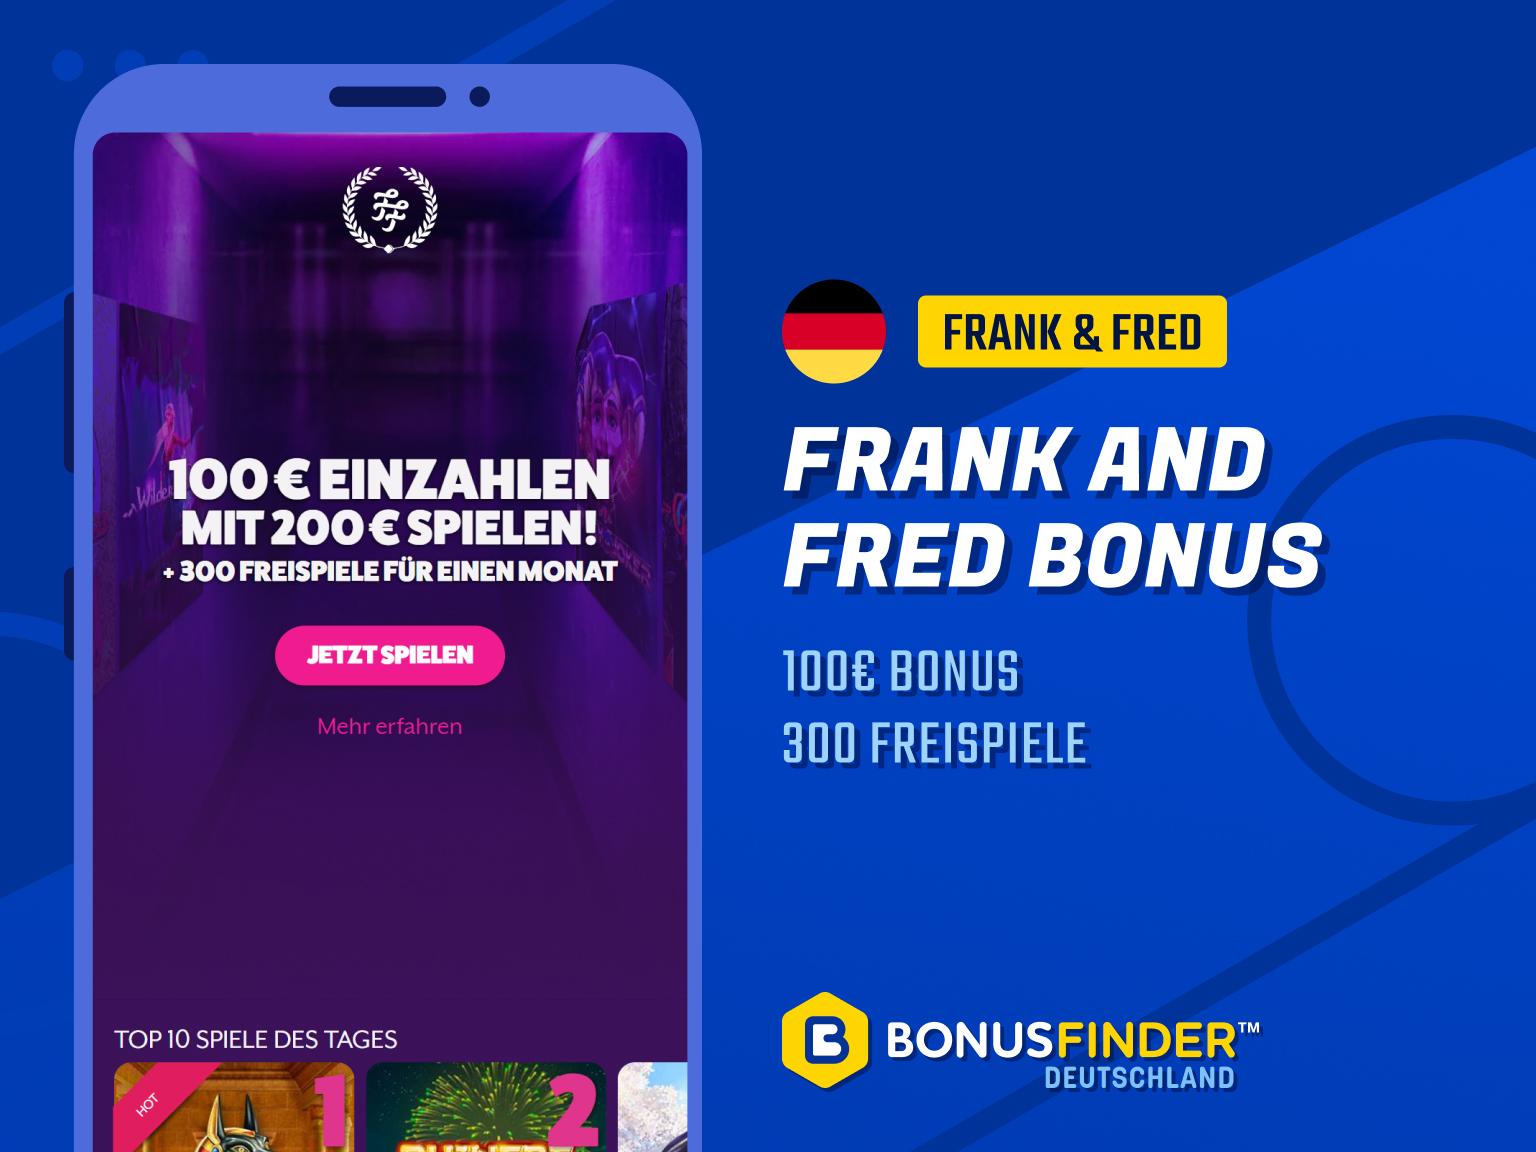 frank and fred casino bonus 2021